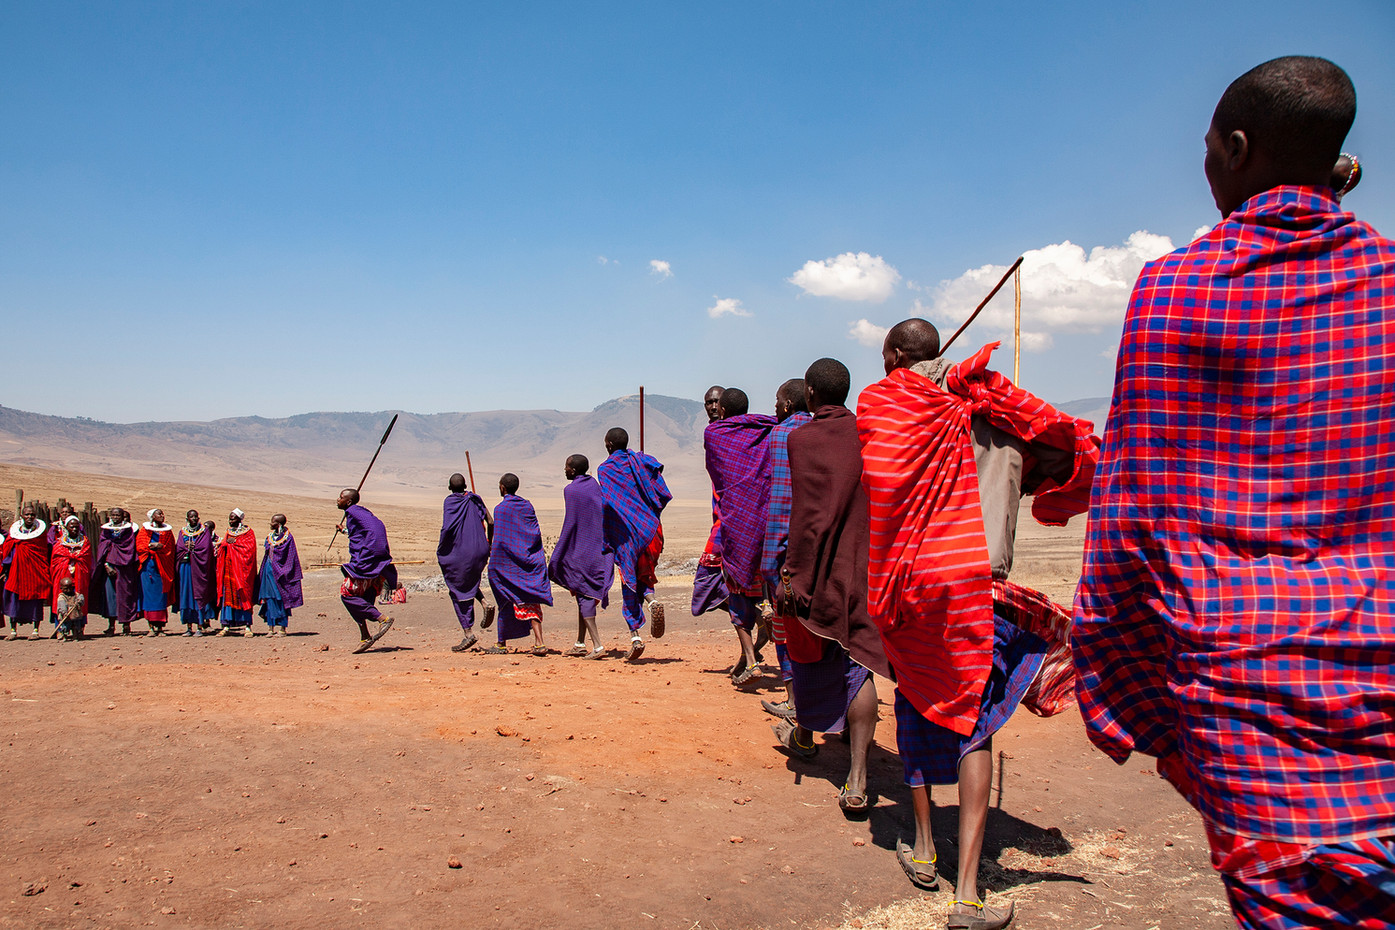 Masai dancing in Ngorongoro Crater highlands, Tanzania